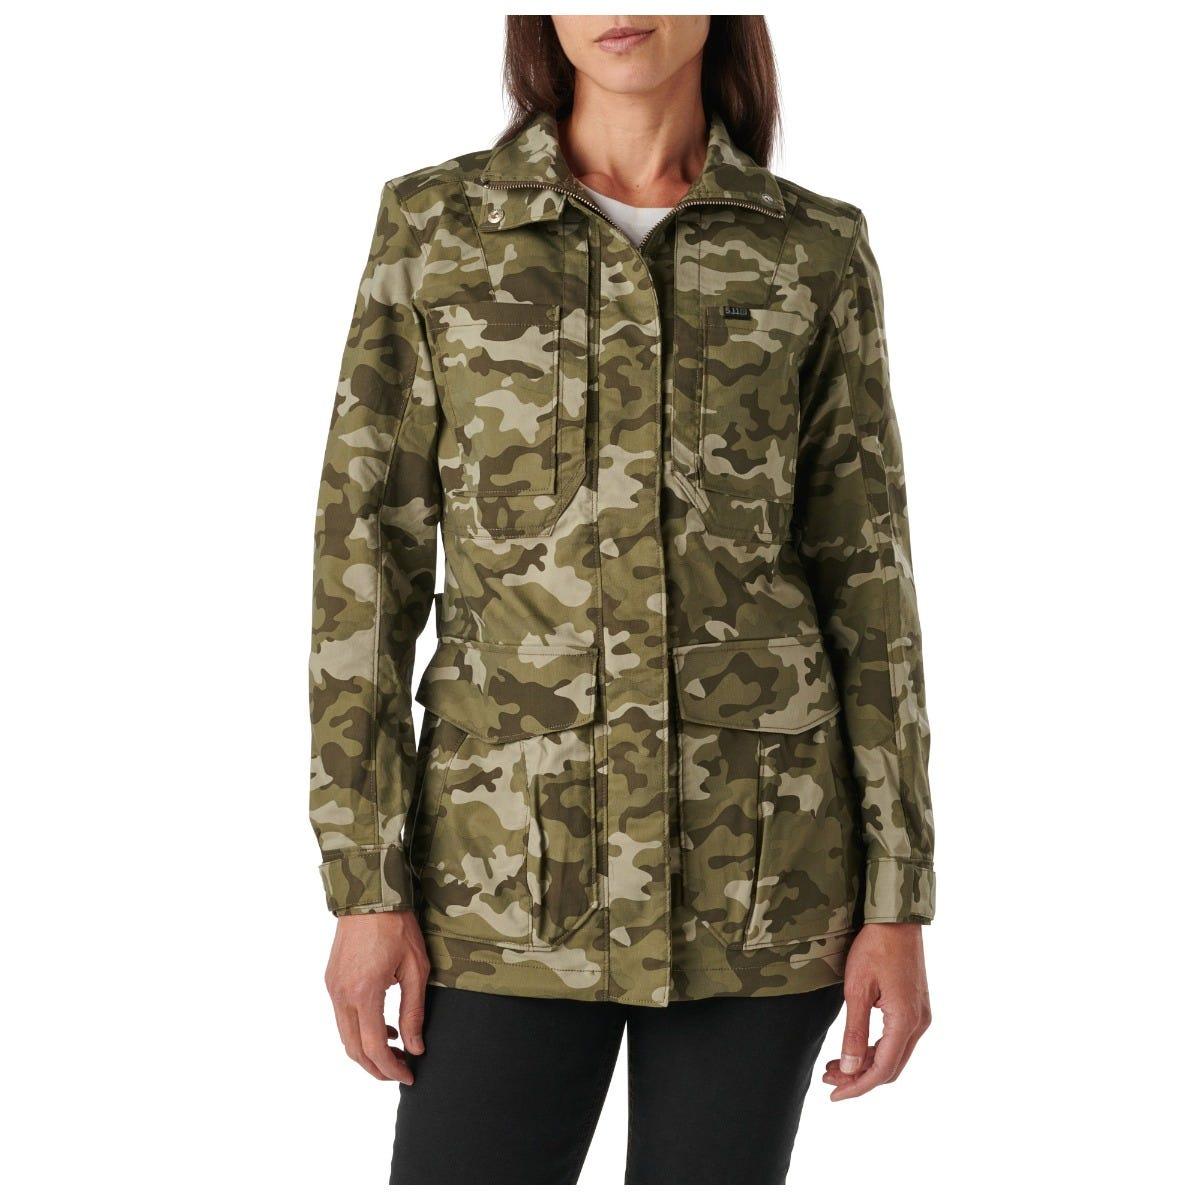 5.11 Tactical Womens Surplus Camo Jacket thumbnail